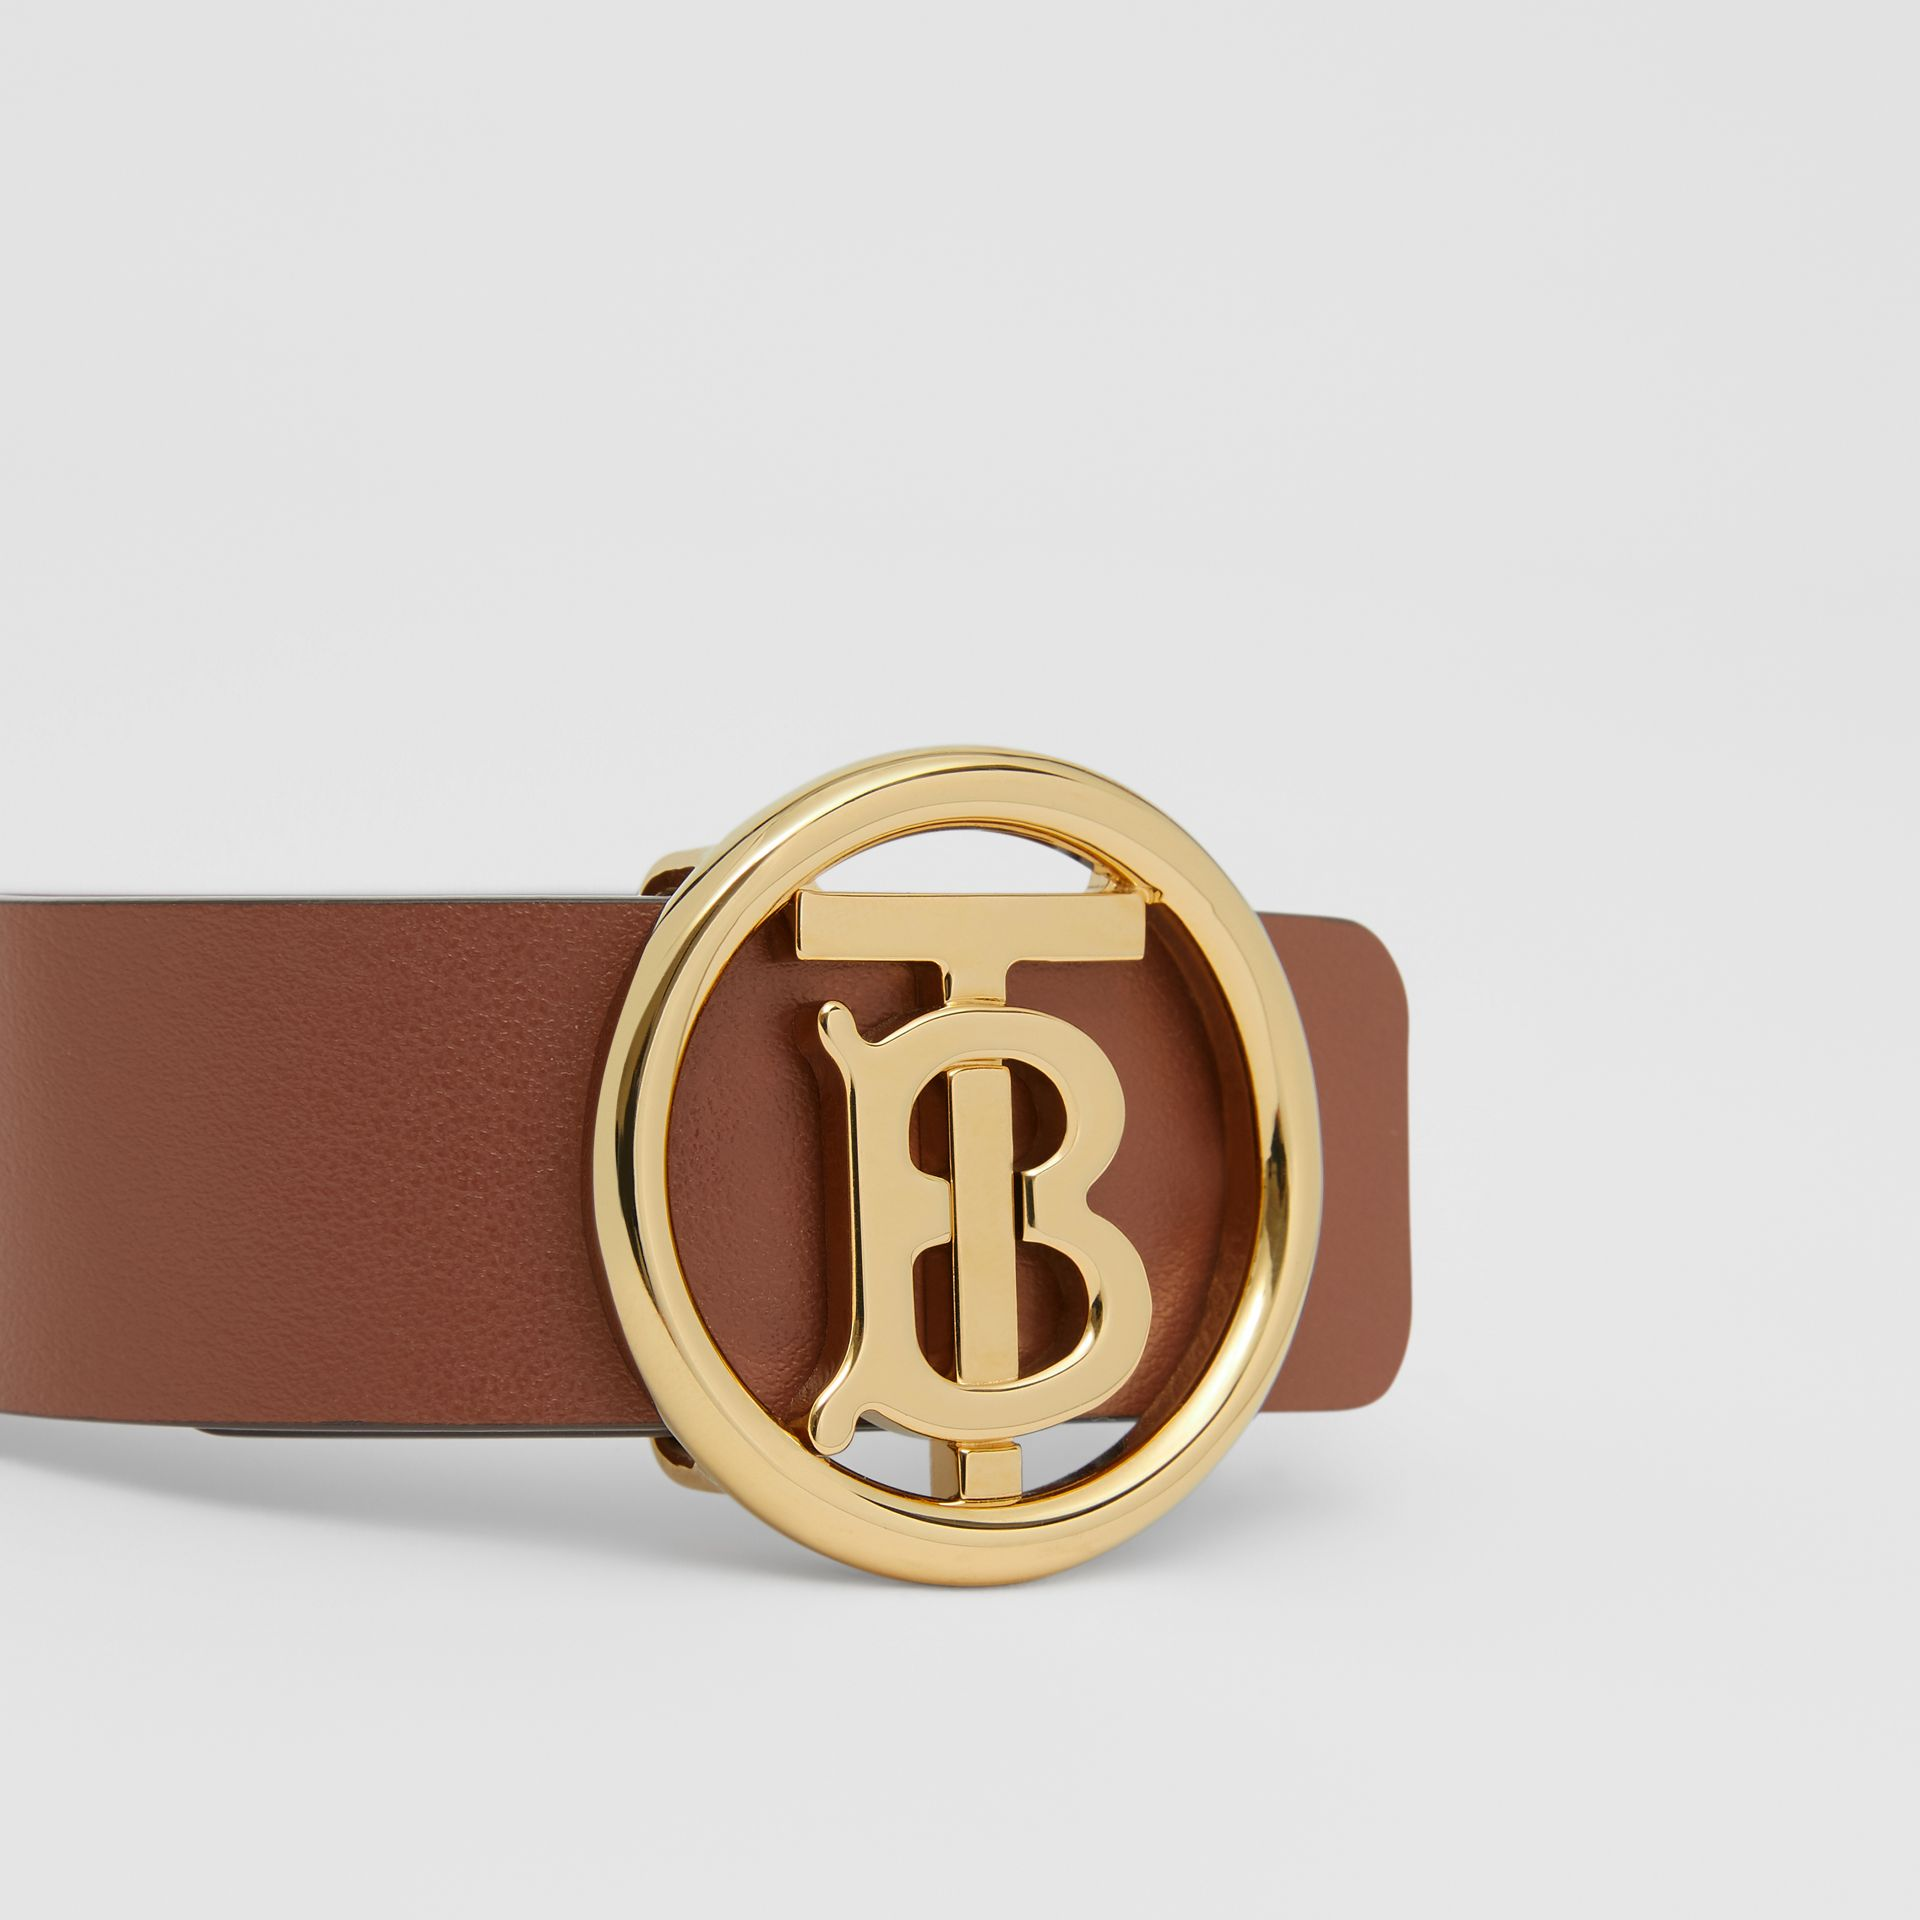 Monogram Motif Leather Bracelet in Tan - Women | Burberry - gallery image 1